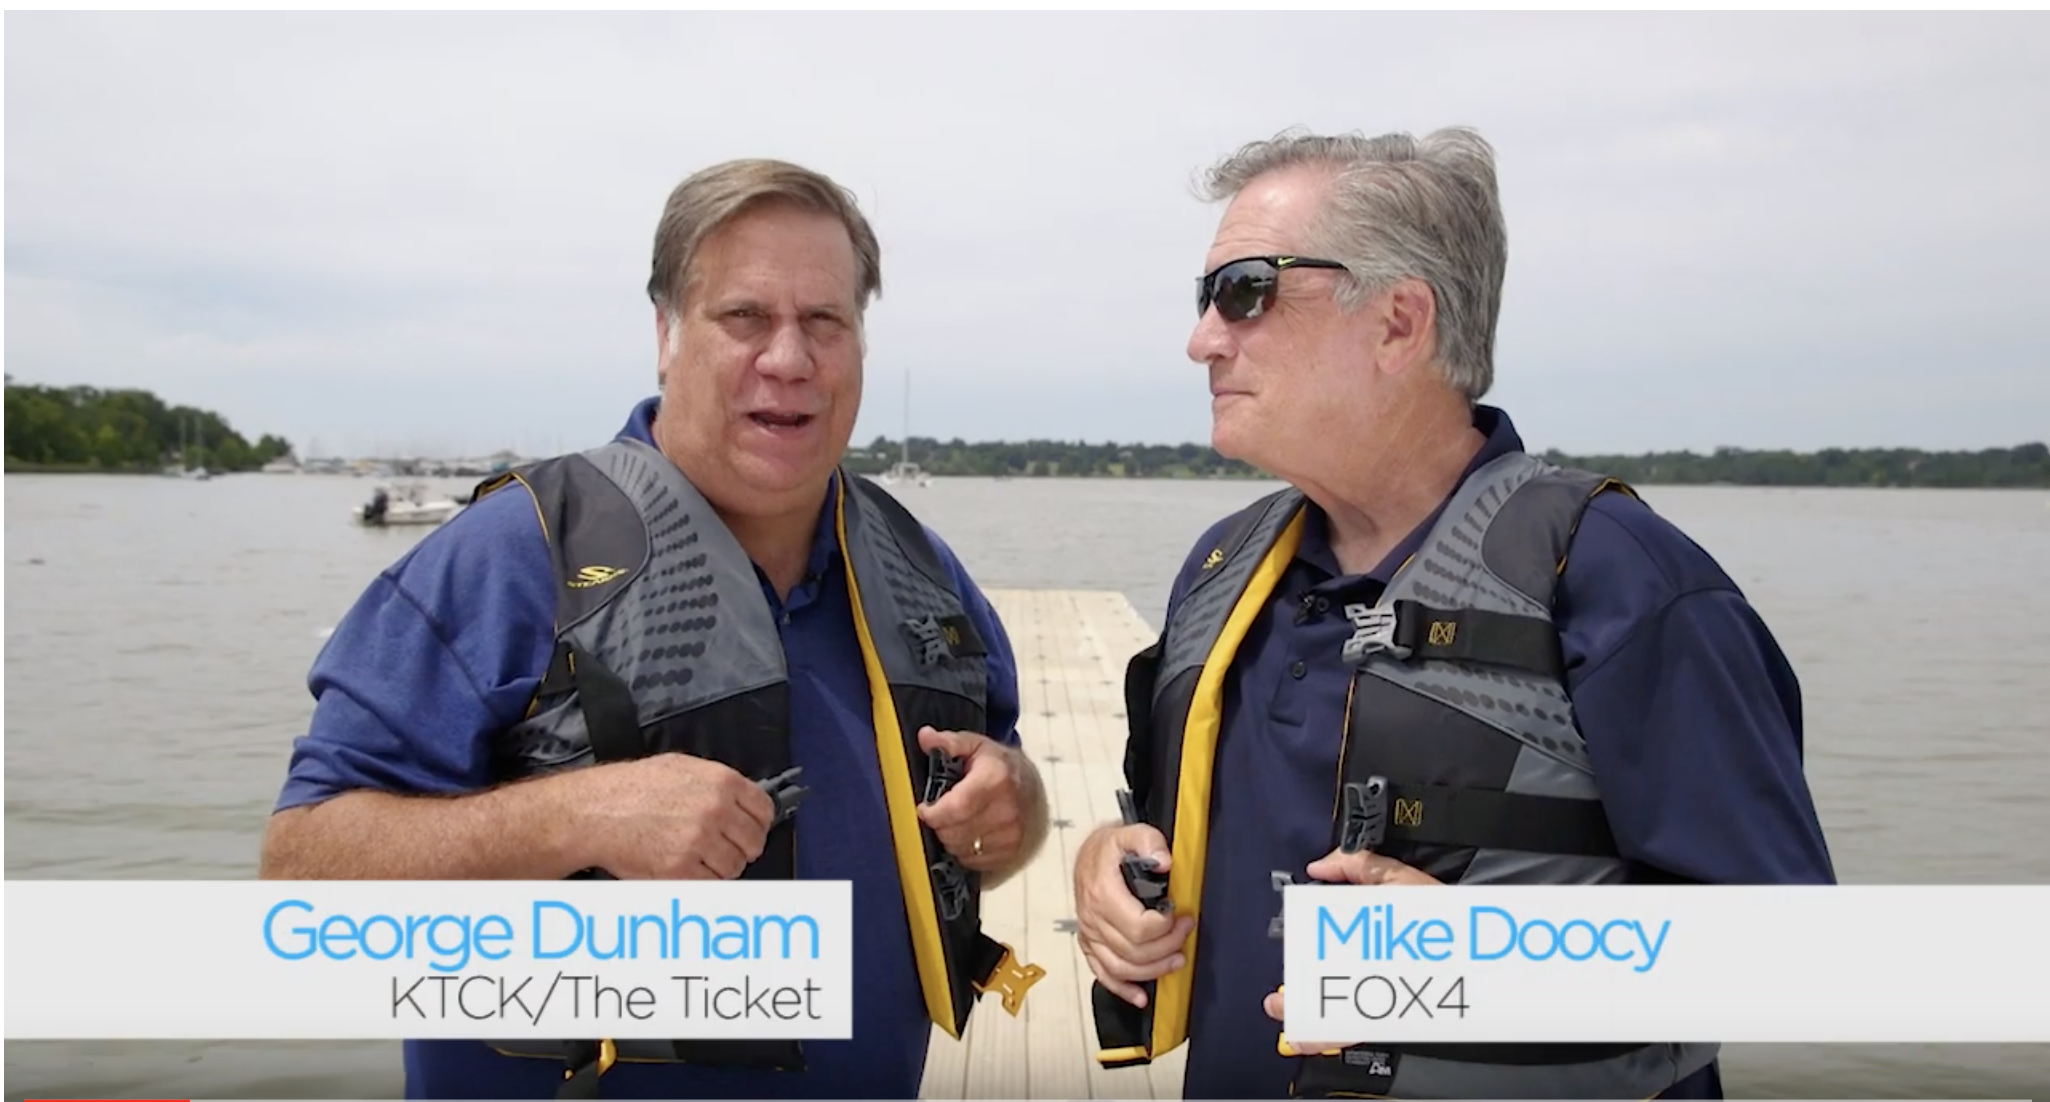 Fox4 Life Vest PSA, Mike & George, 2019